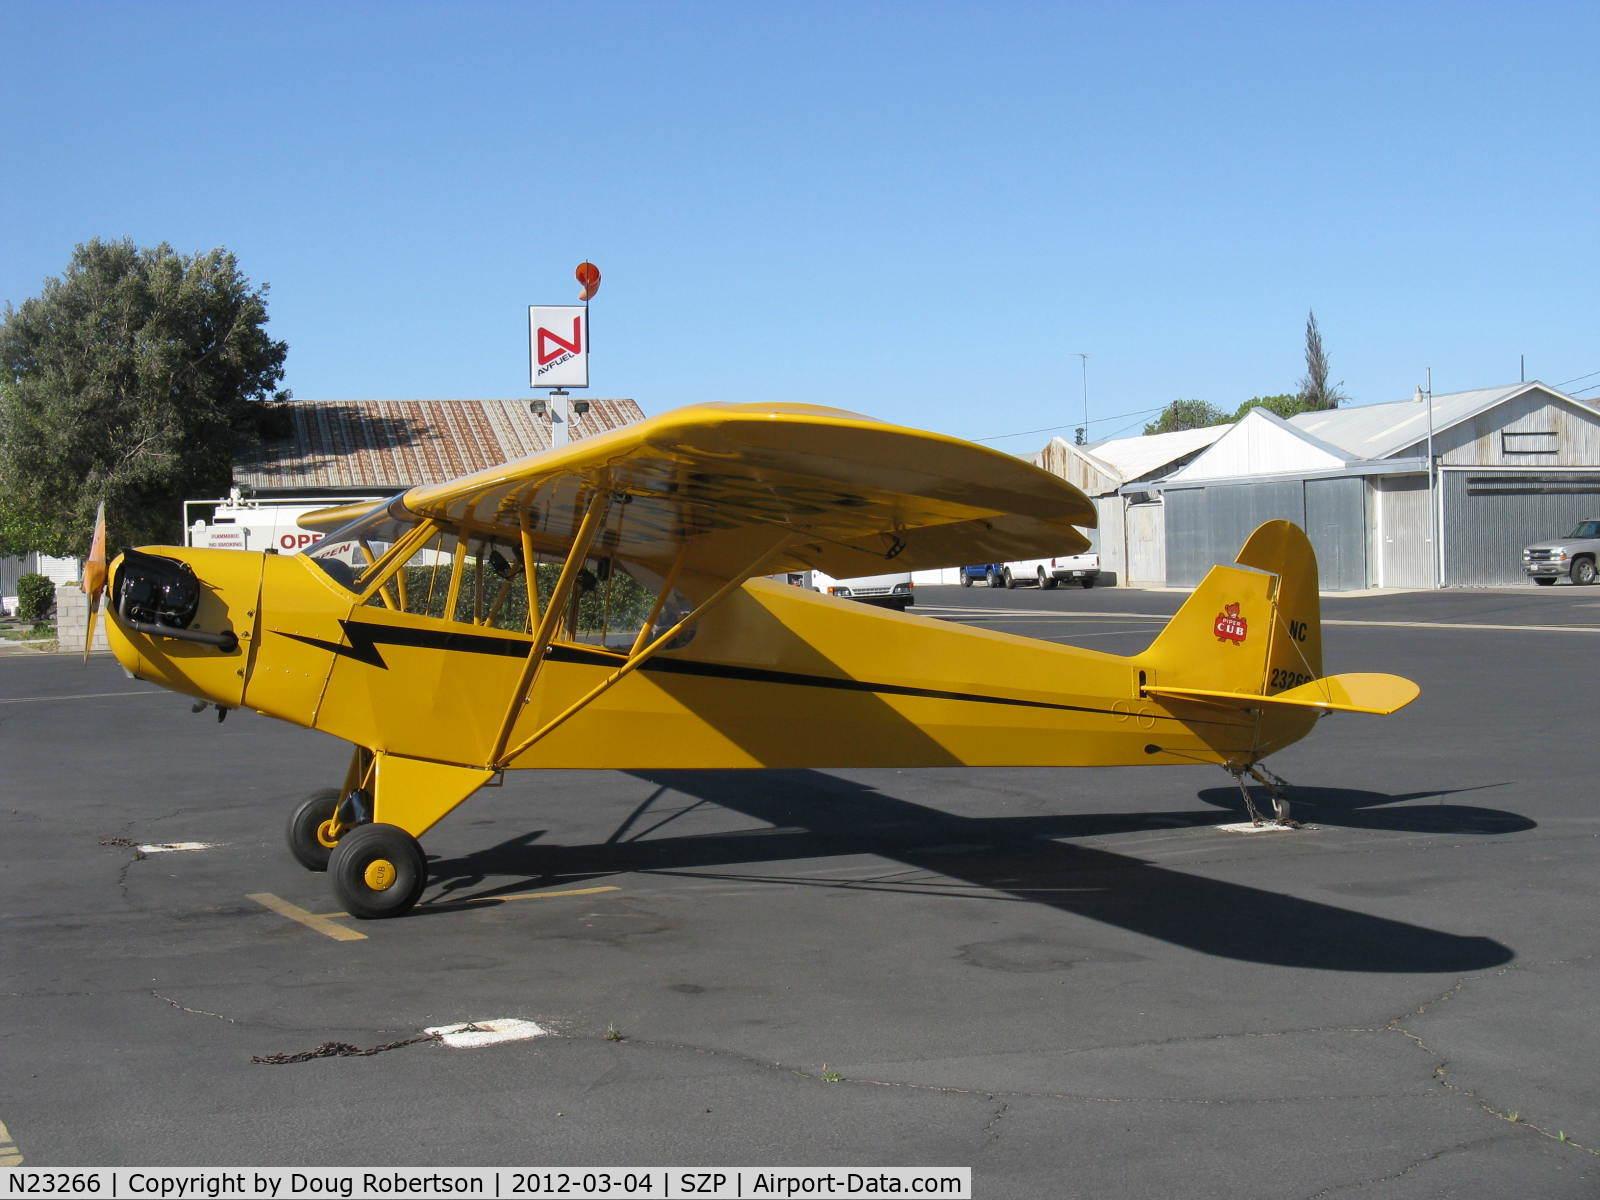 N23266, 1939 Piper J3C-65 C/N 3113, 1939 Piper J3C-65 CUB, Continental A&C65 65 Hp